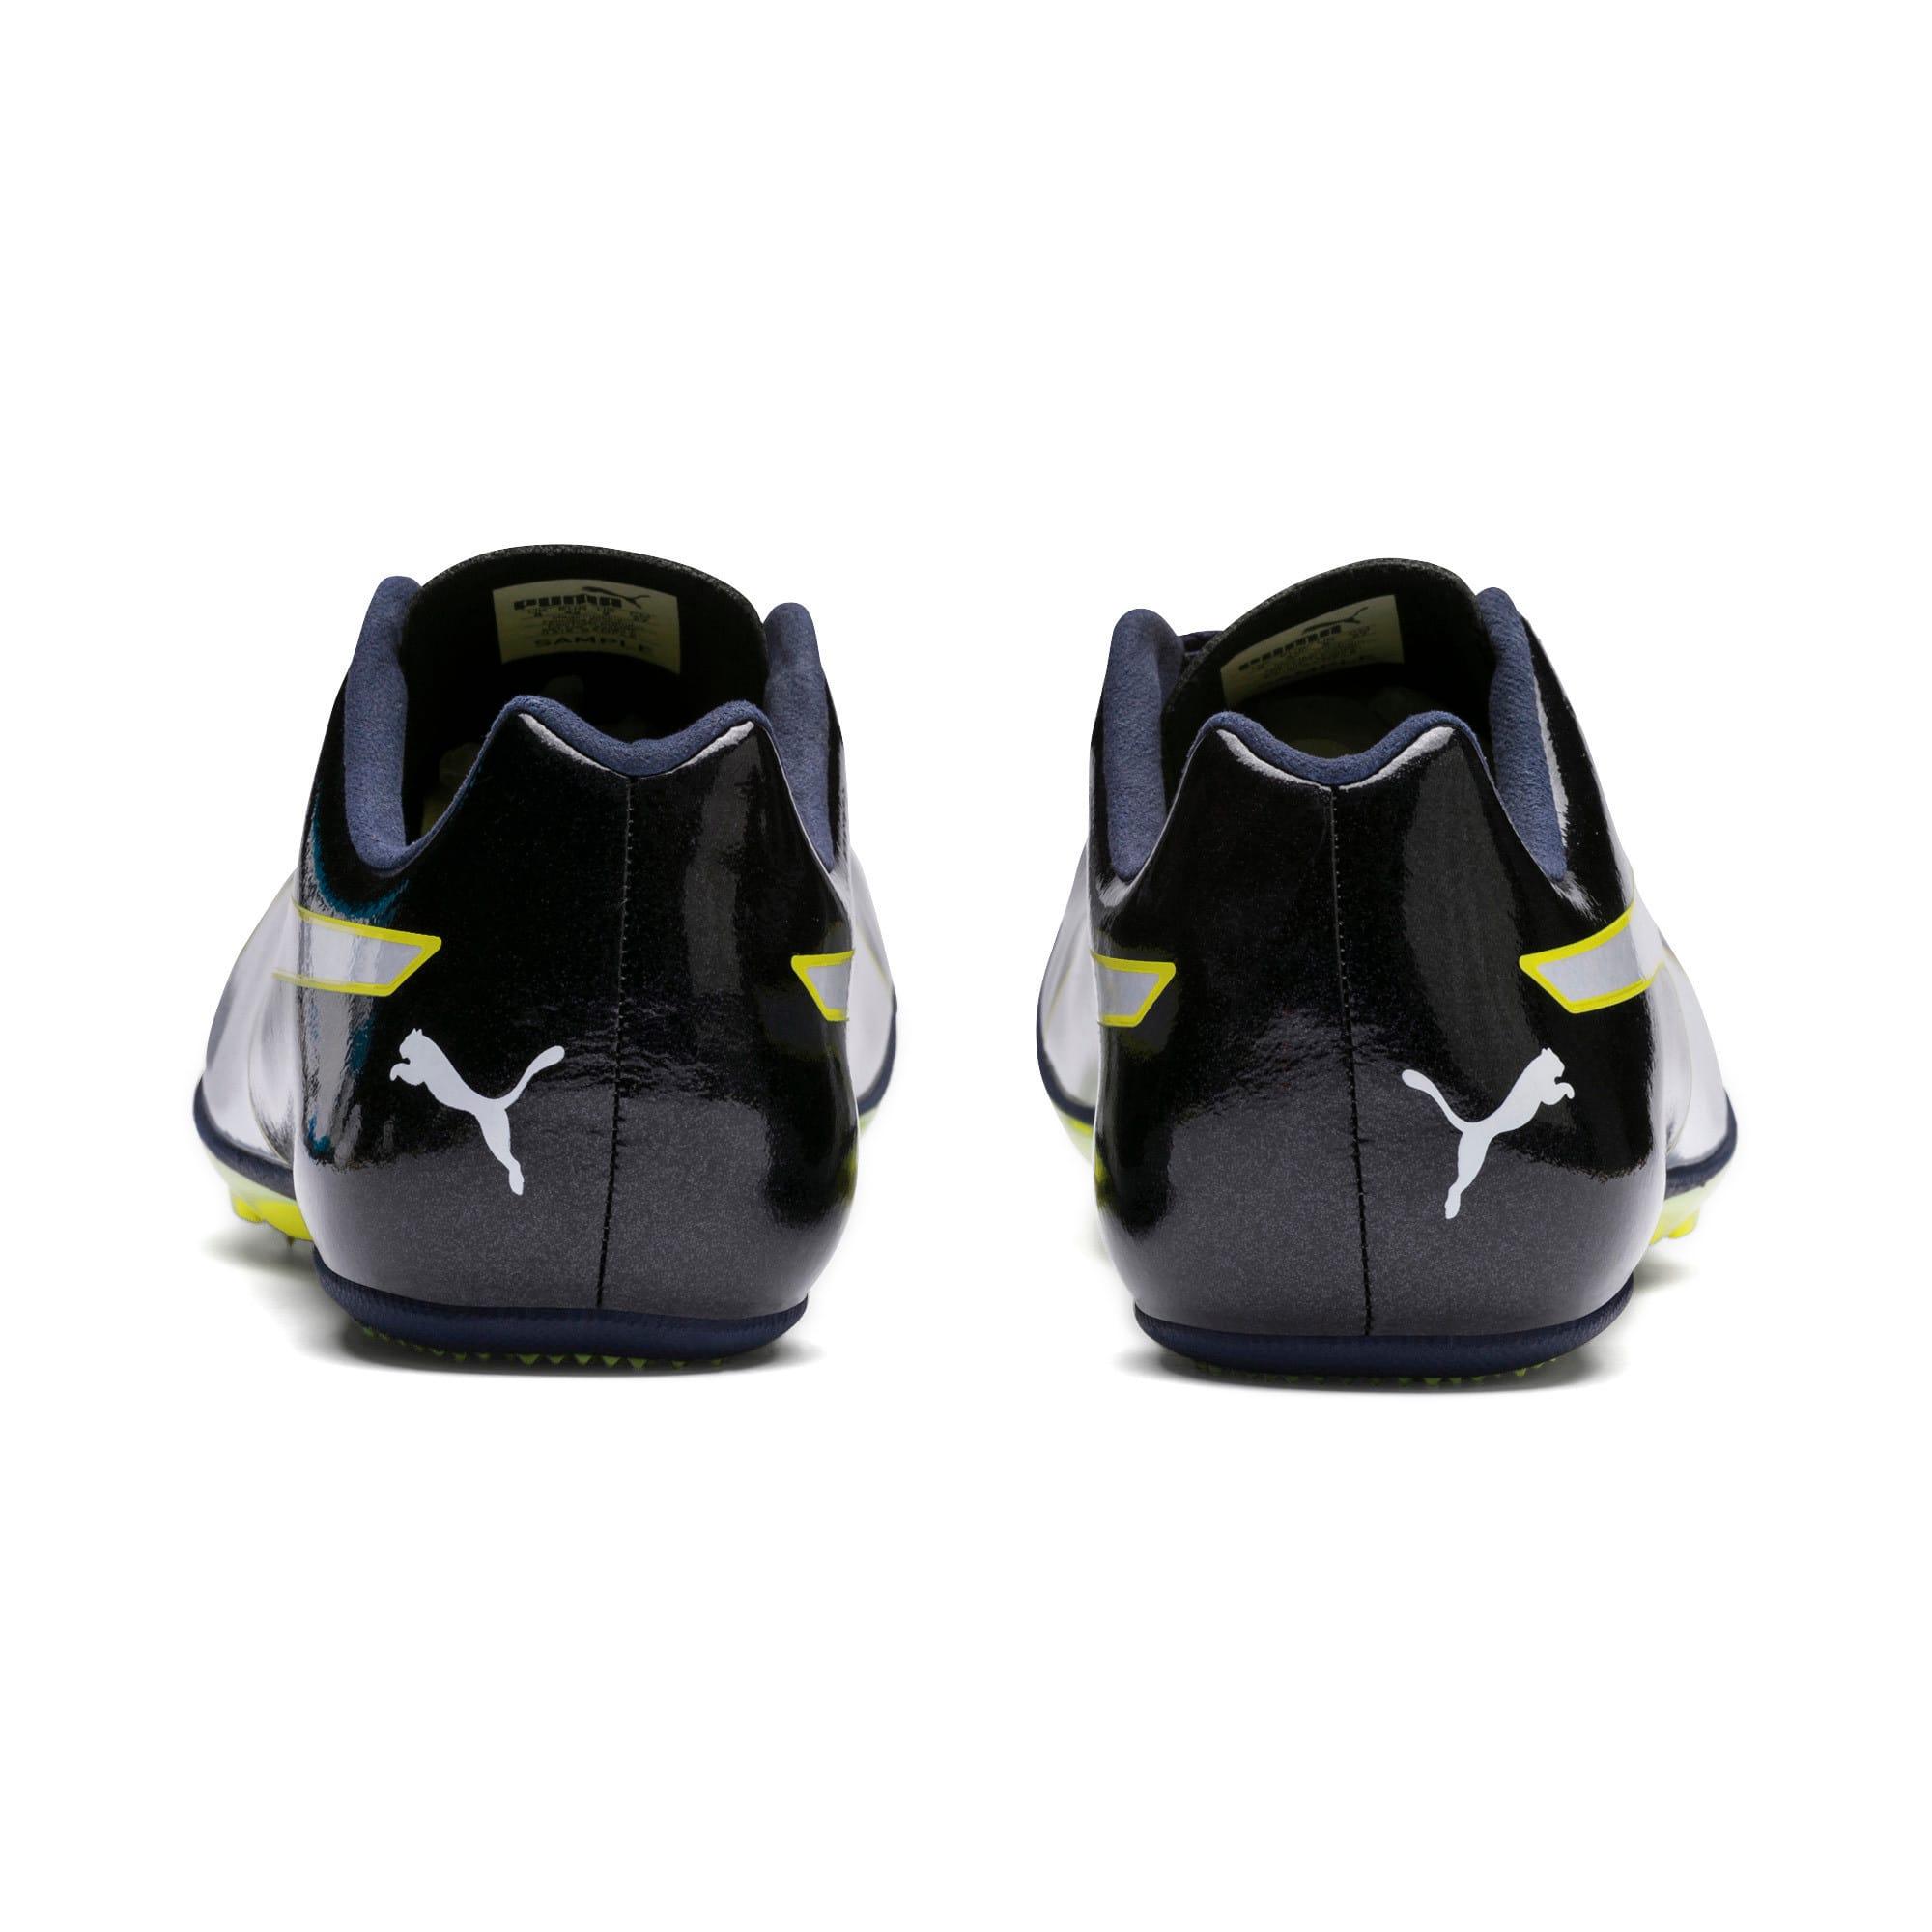 Thumbnail 3 of evoSPEED Sprint 9 Running Shoes, Black-Blazing Yellow-White, medium-IND